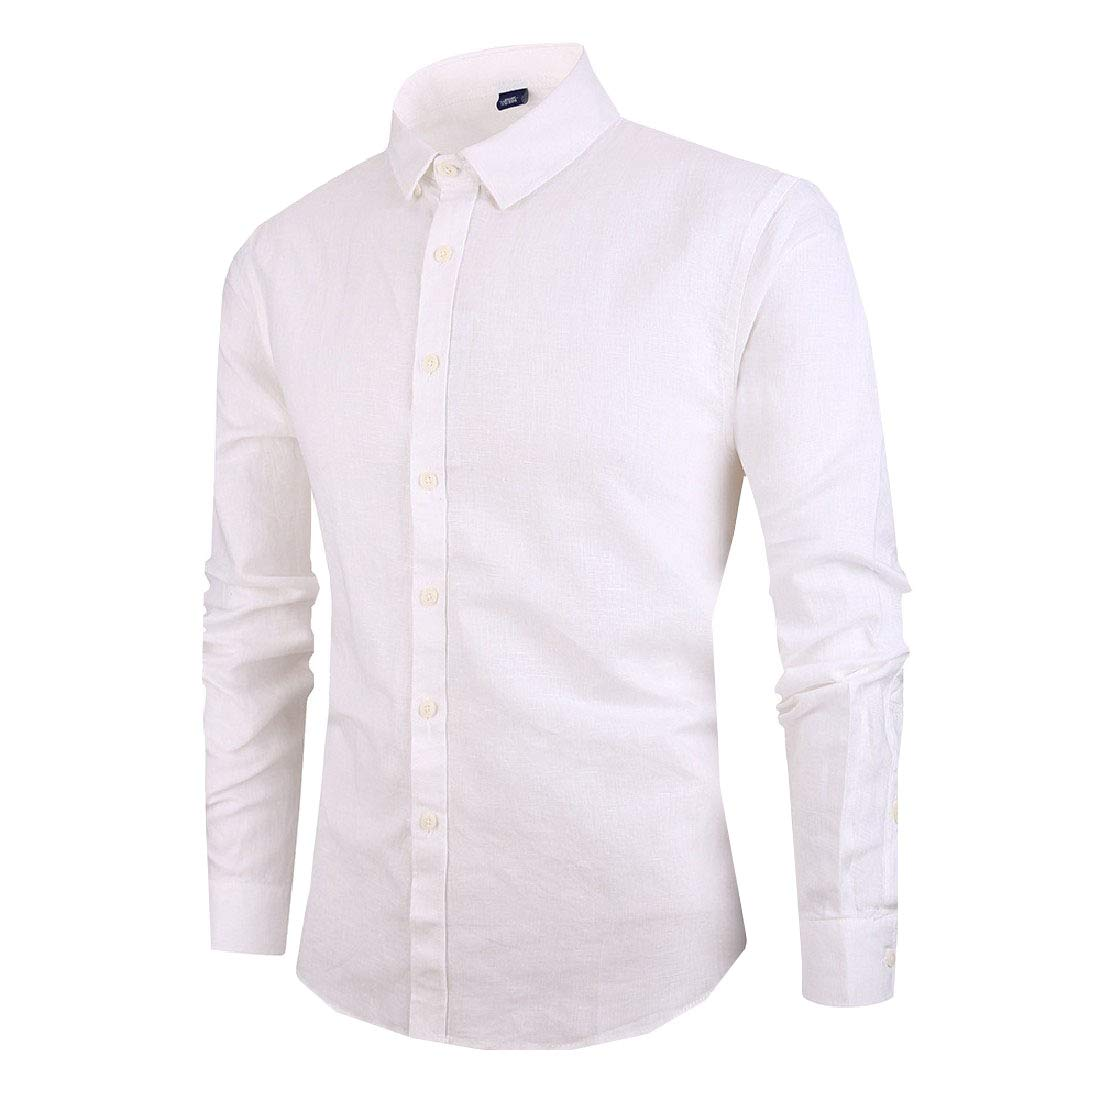 RDHOPE-Men Solid-Colored Long Sleeve Turn-Down Collar Flax Slim Western Shirt